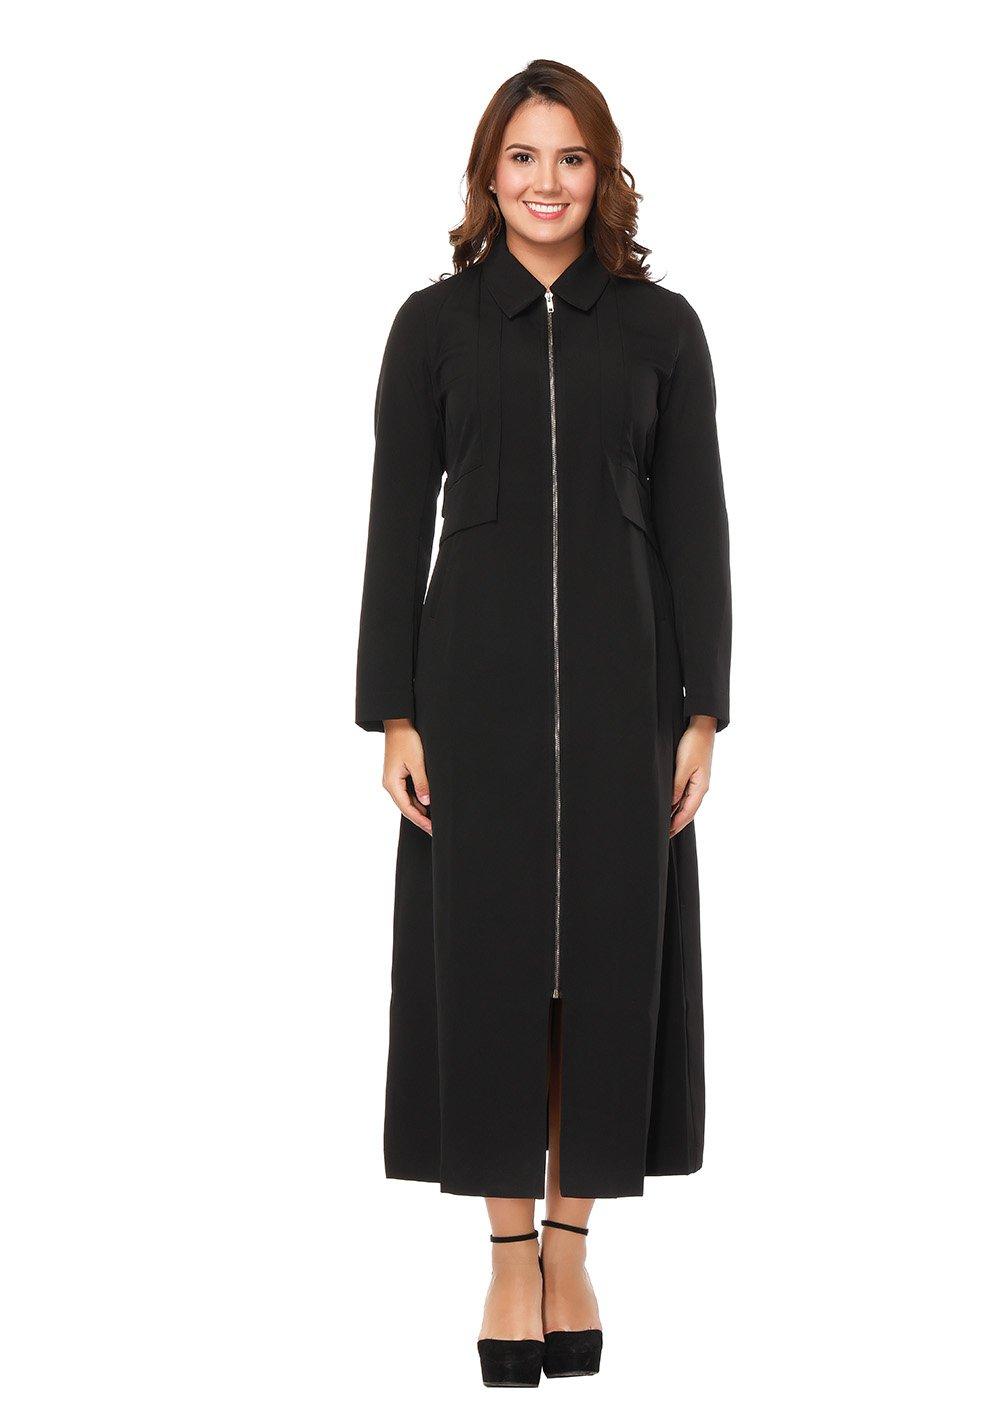 Women Modest Zipper Up Slim fit Long Sleeve Maxi Muslim Abaya Trench Coat Jacket Dress Overcoat (L, Black)